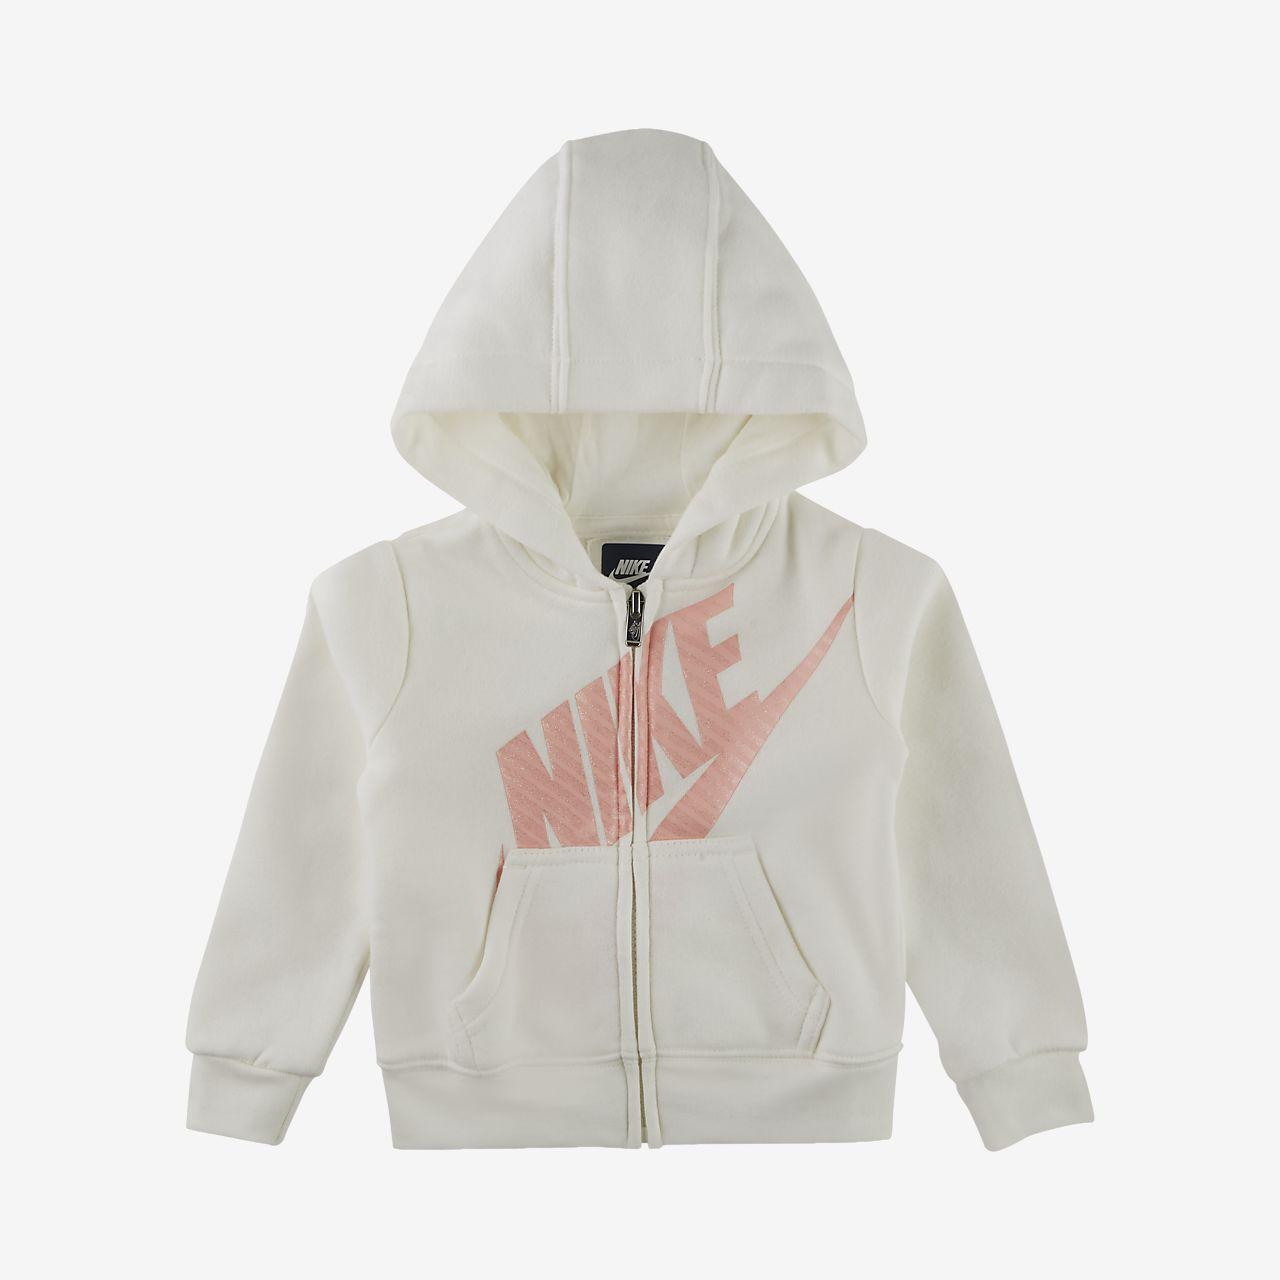 Nike Sportswear 婴童连帽衫